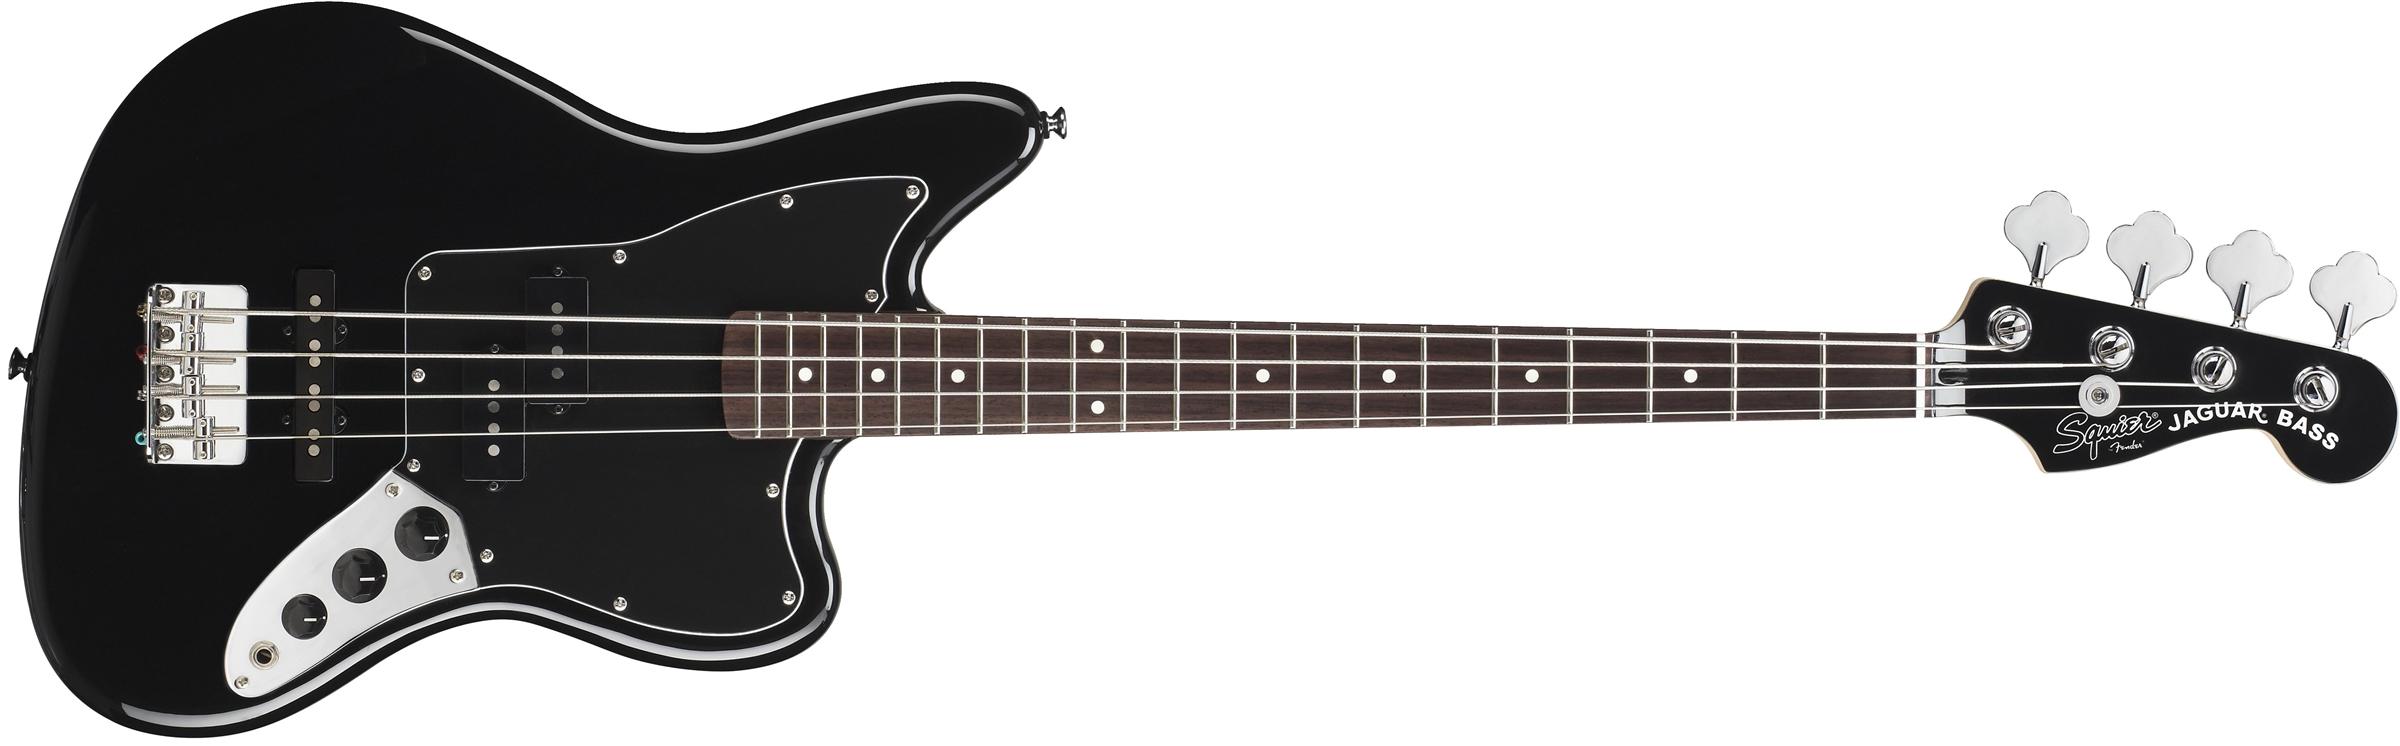 vintage modified jaguar bass special ss short scale. Black Bedroom Furniture Sets. Home Design Ideas